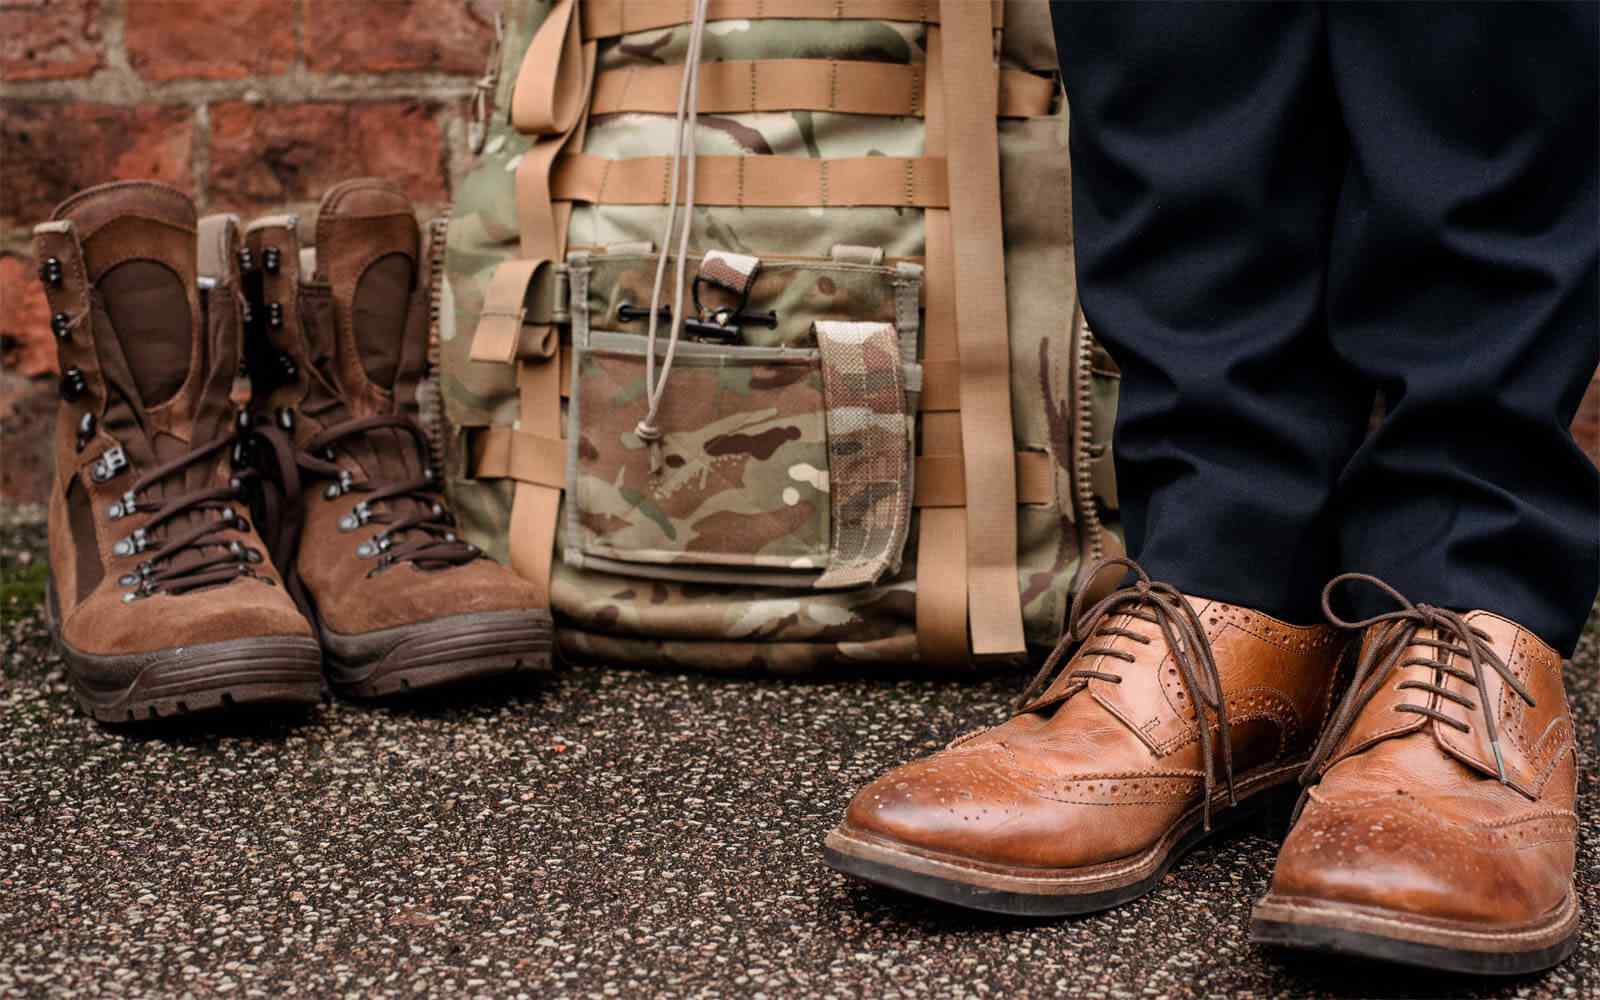 Man's shoes next to a bag